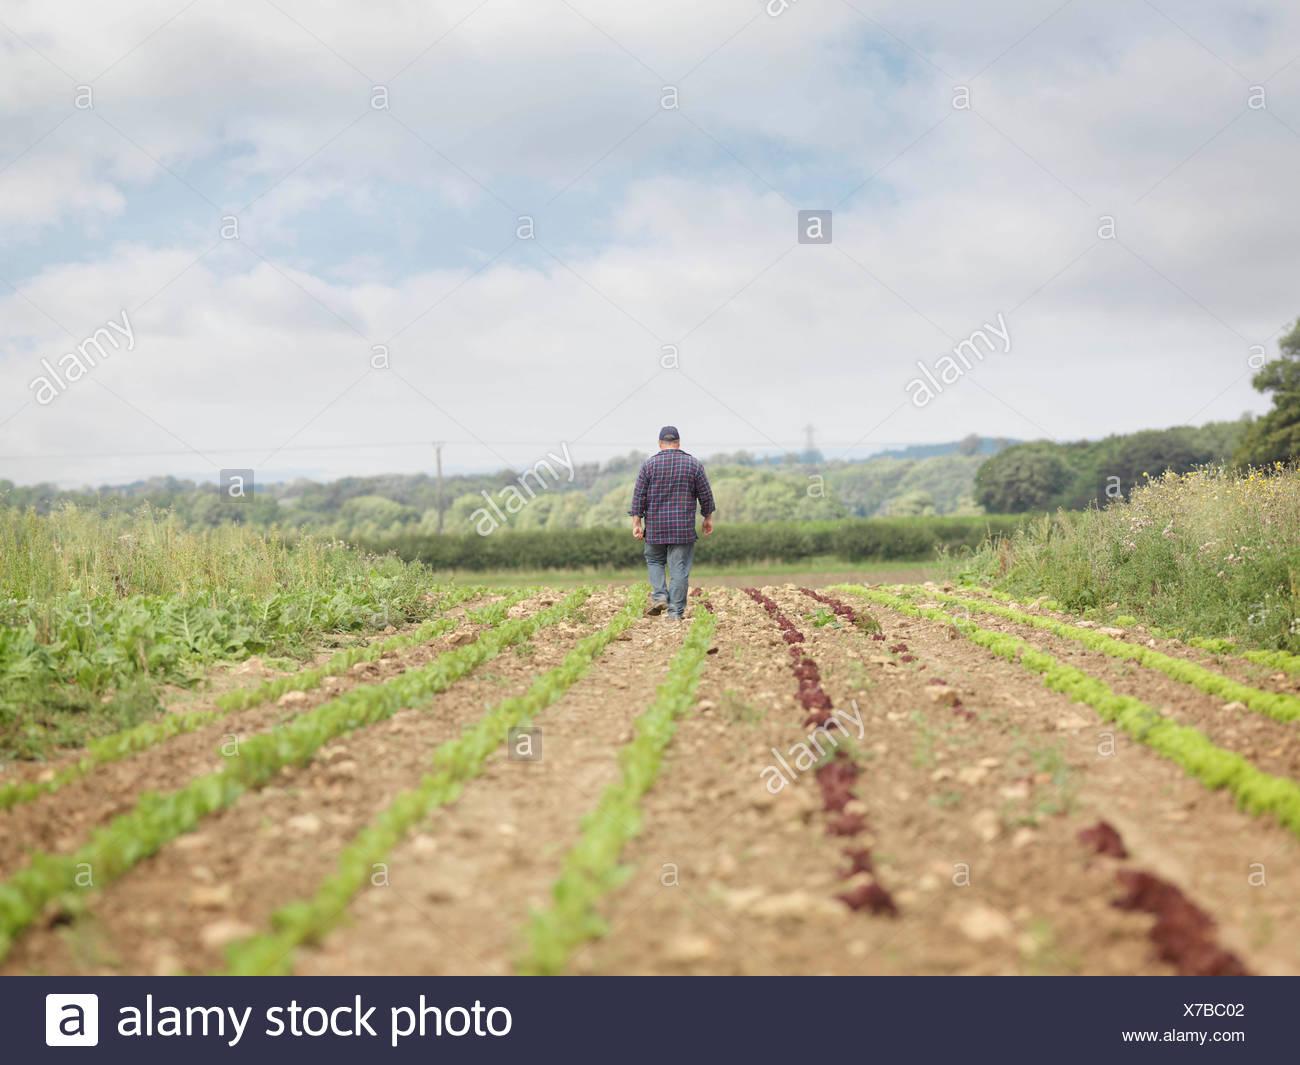 Granjero caminando en campo de cultivo Vista posterior Imagen De Stock